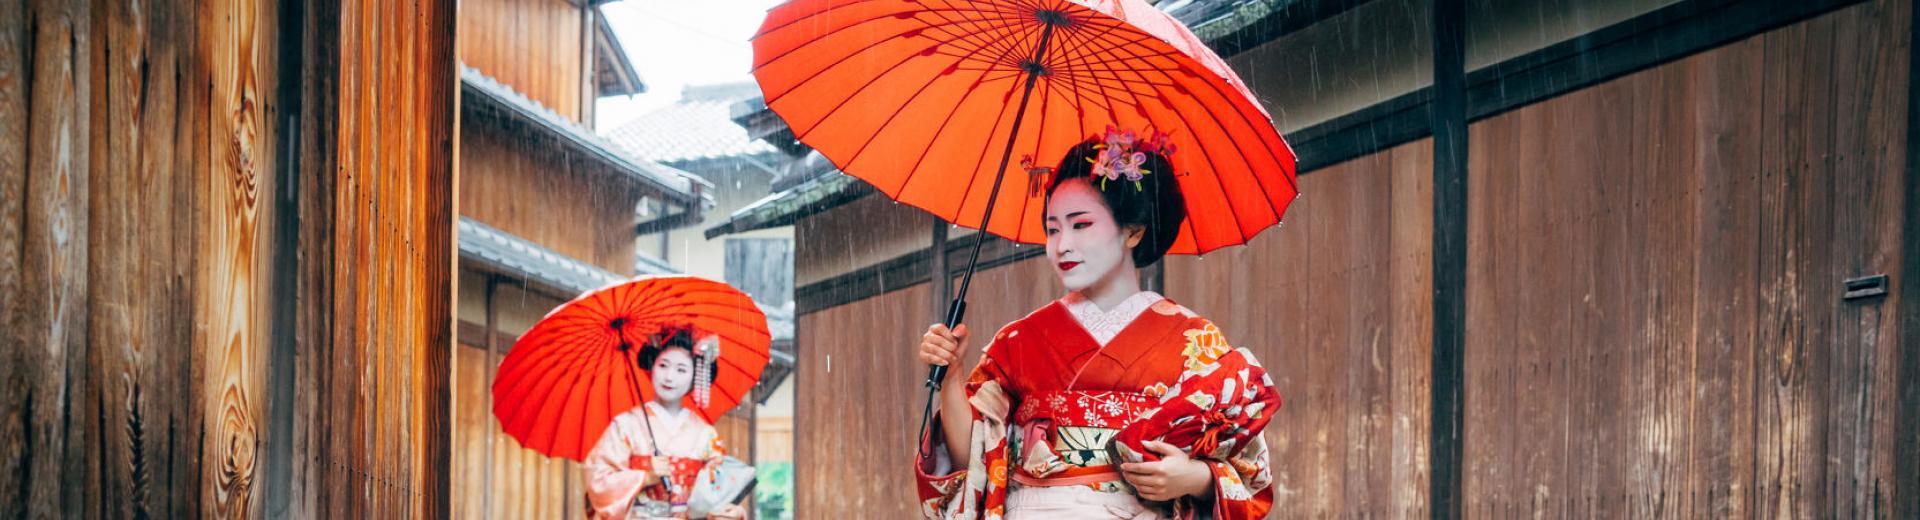 Japan feature